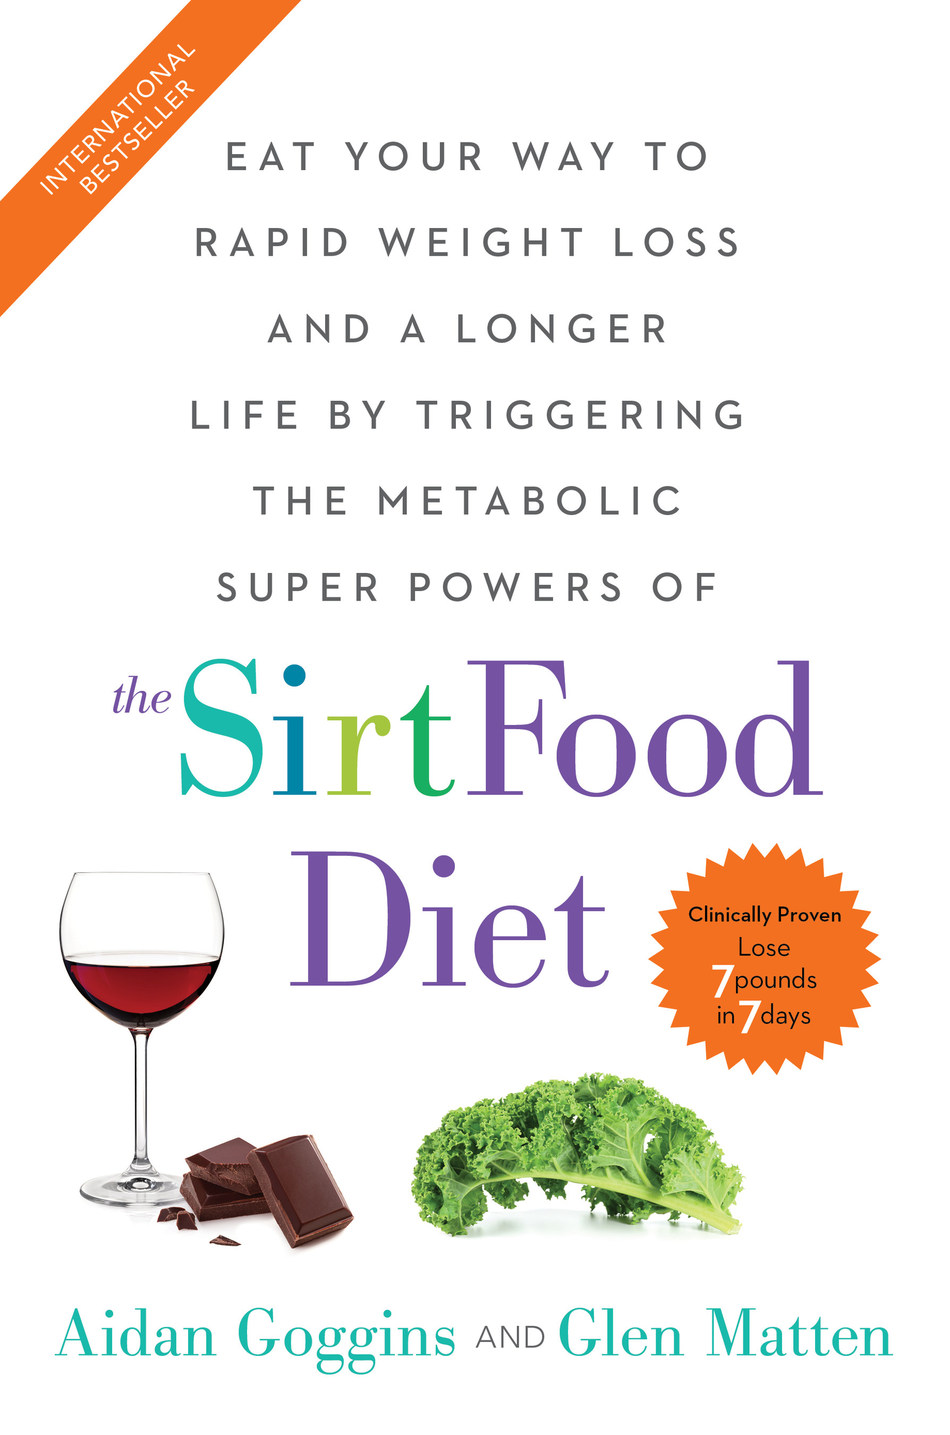 The Sirtfood Diet by Aidan Goggins and Glen Matten/North Star Way